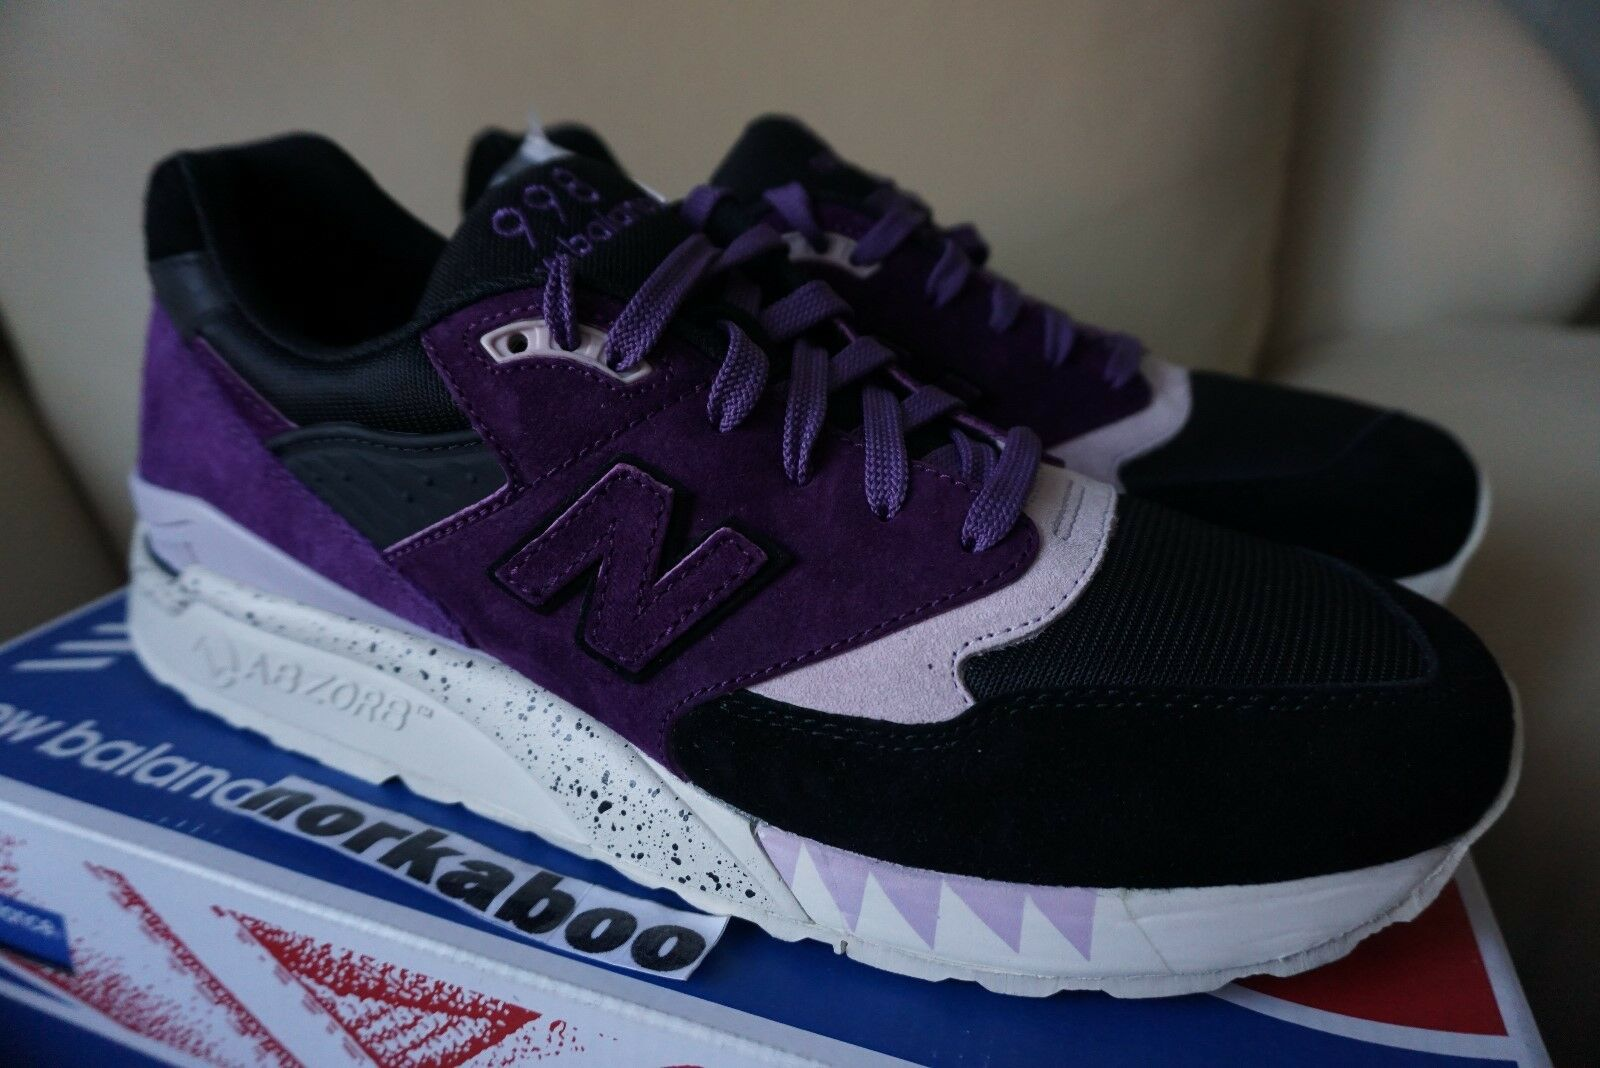 New Balance x  Freaker 998 CM998SNF Tassie Devil purple fieg 1500 10 10.5